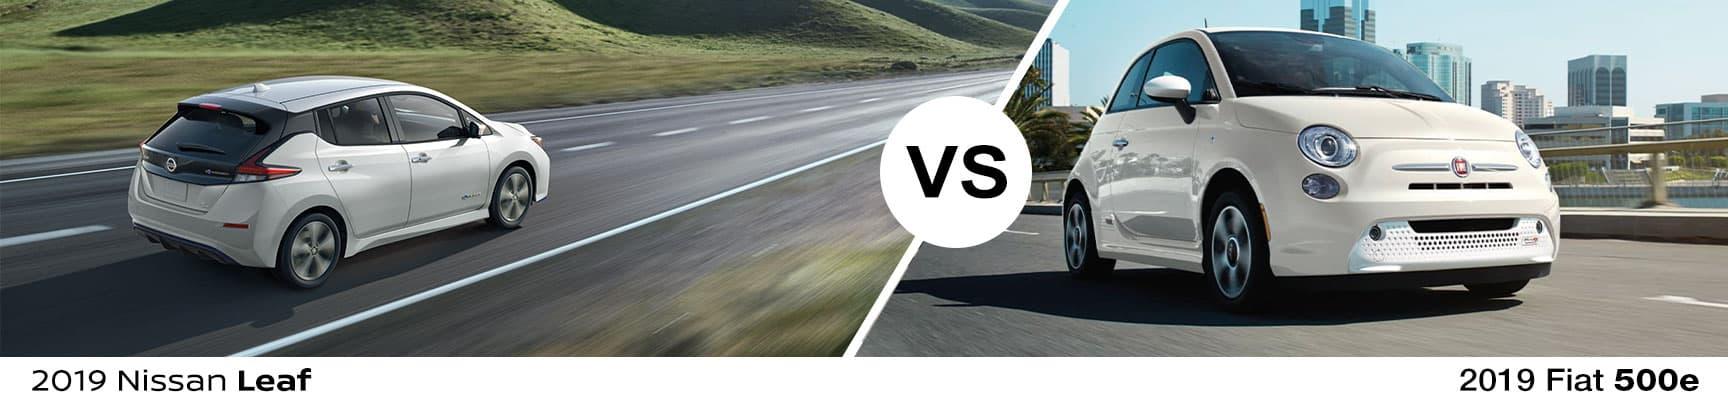 2019 Nissan Leaf vs 2019 Fiat 500e